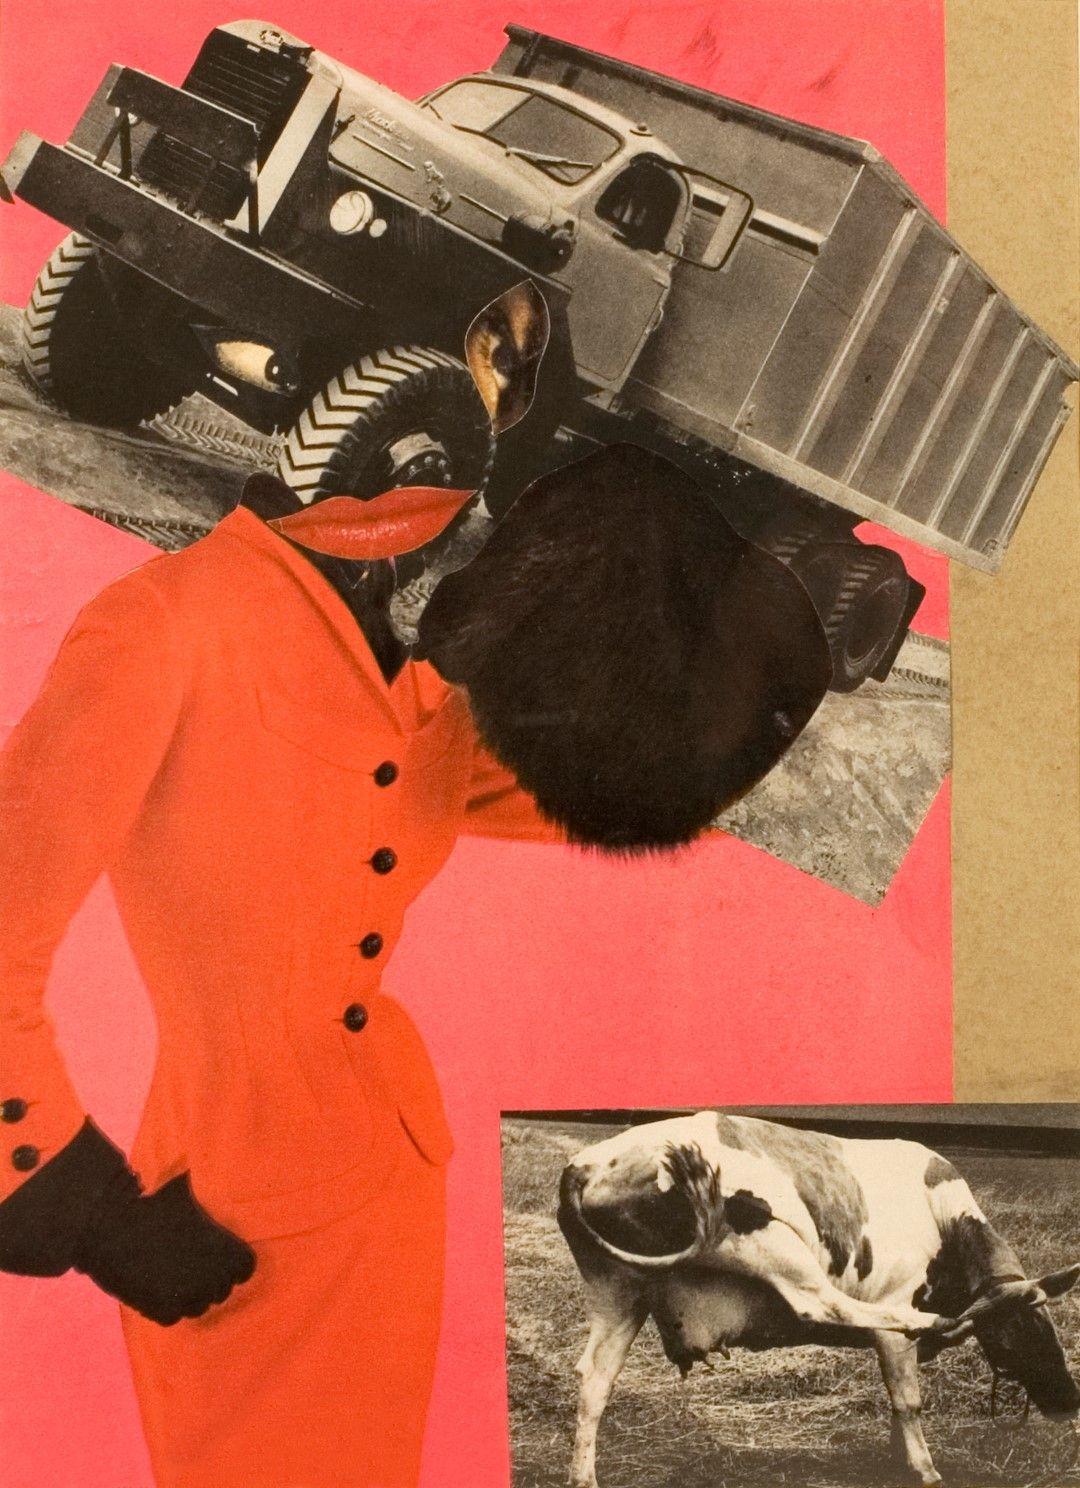 Erró, Untitled, circa 1959, collage.